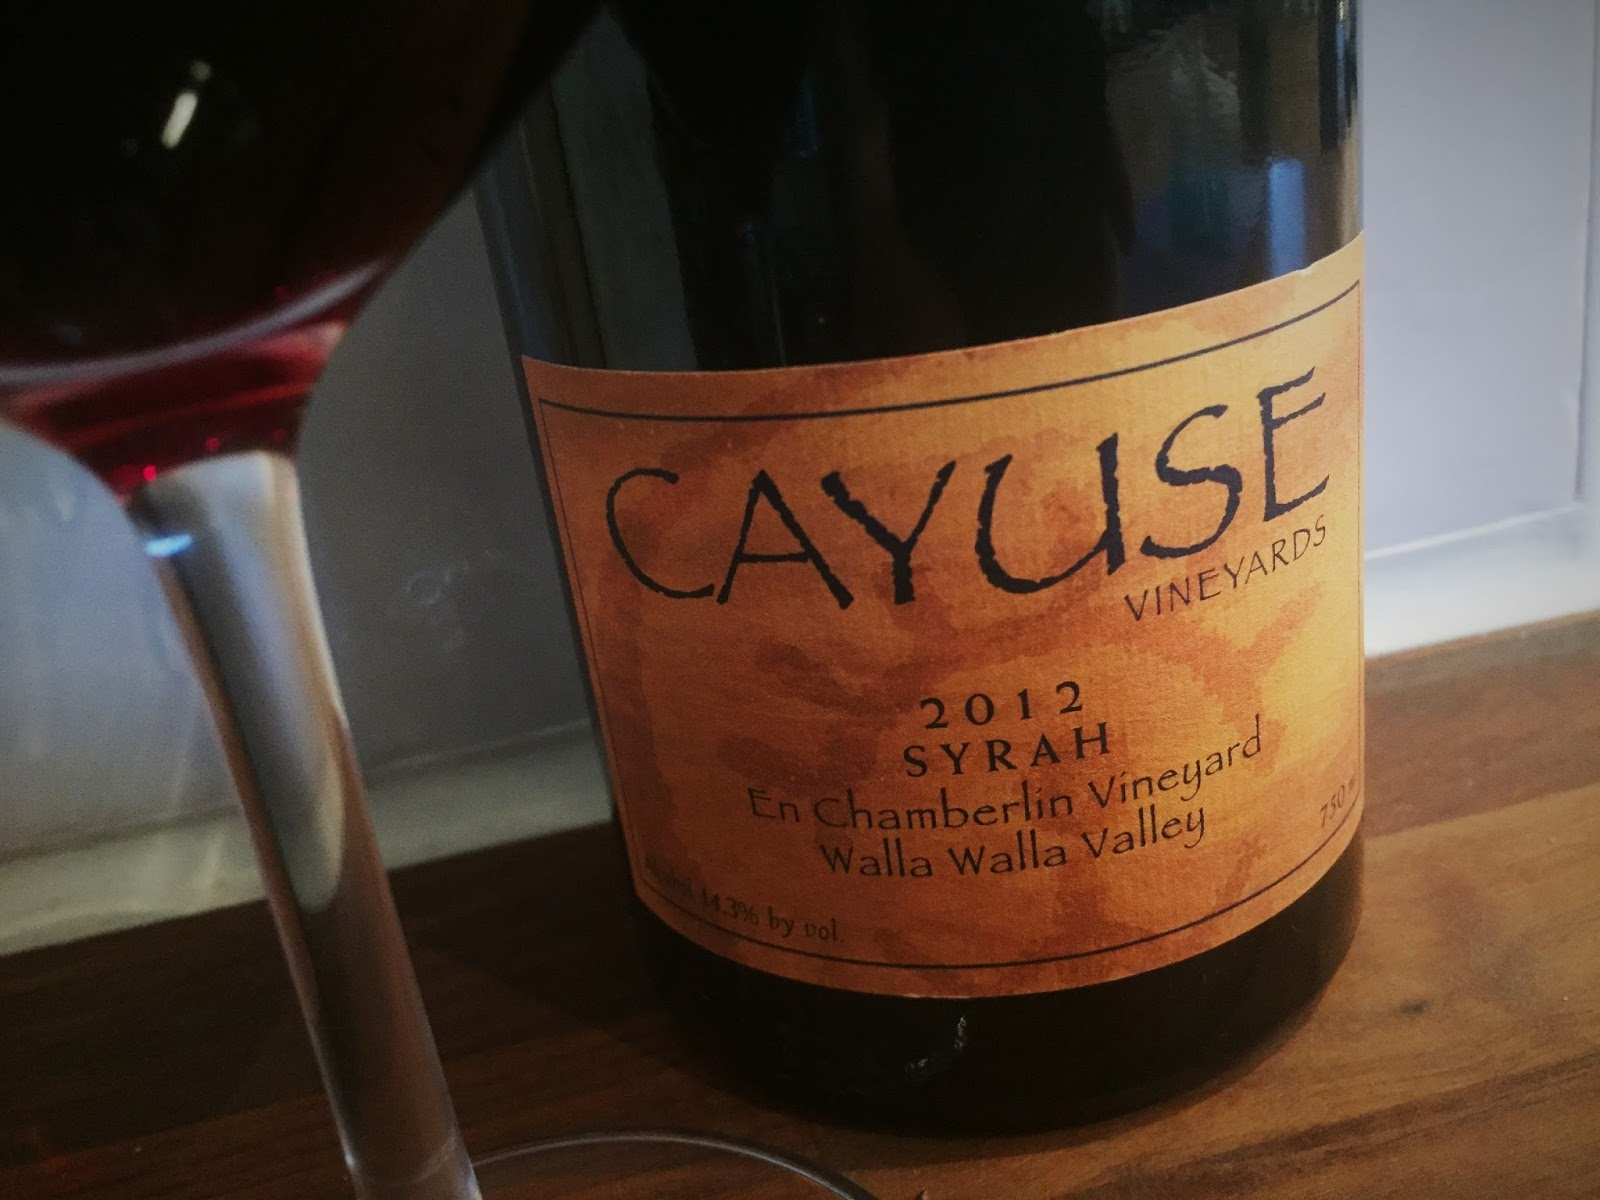 Caf rotsunda tv knasiga bortamatcher 6 7 september for Cayuse vineyards